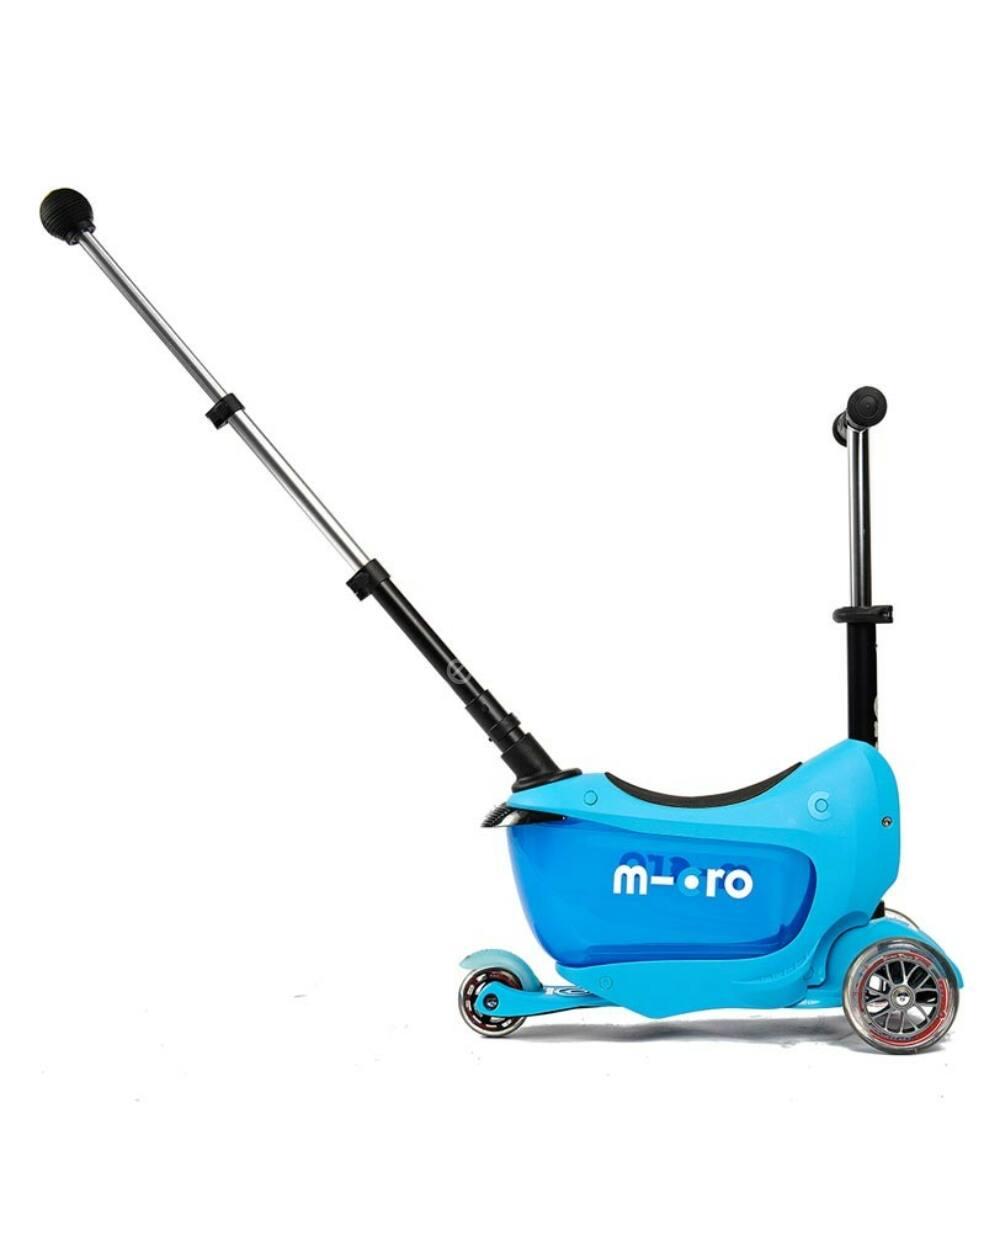 Micro Mini2go Deluxe Plus roller tologató rúddal, kék